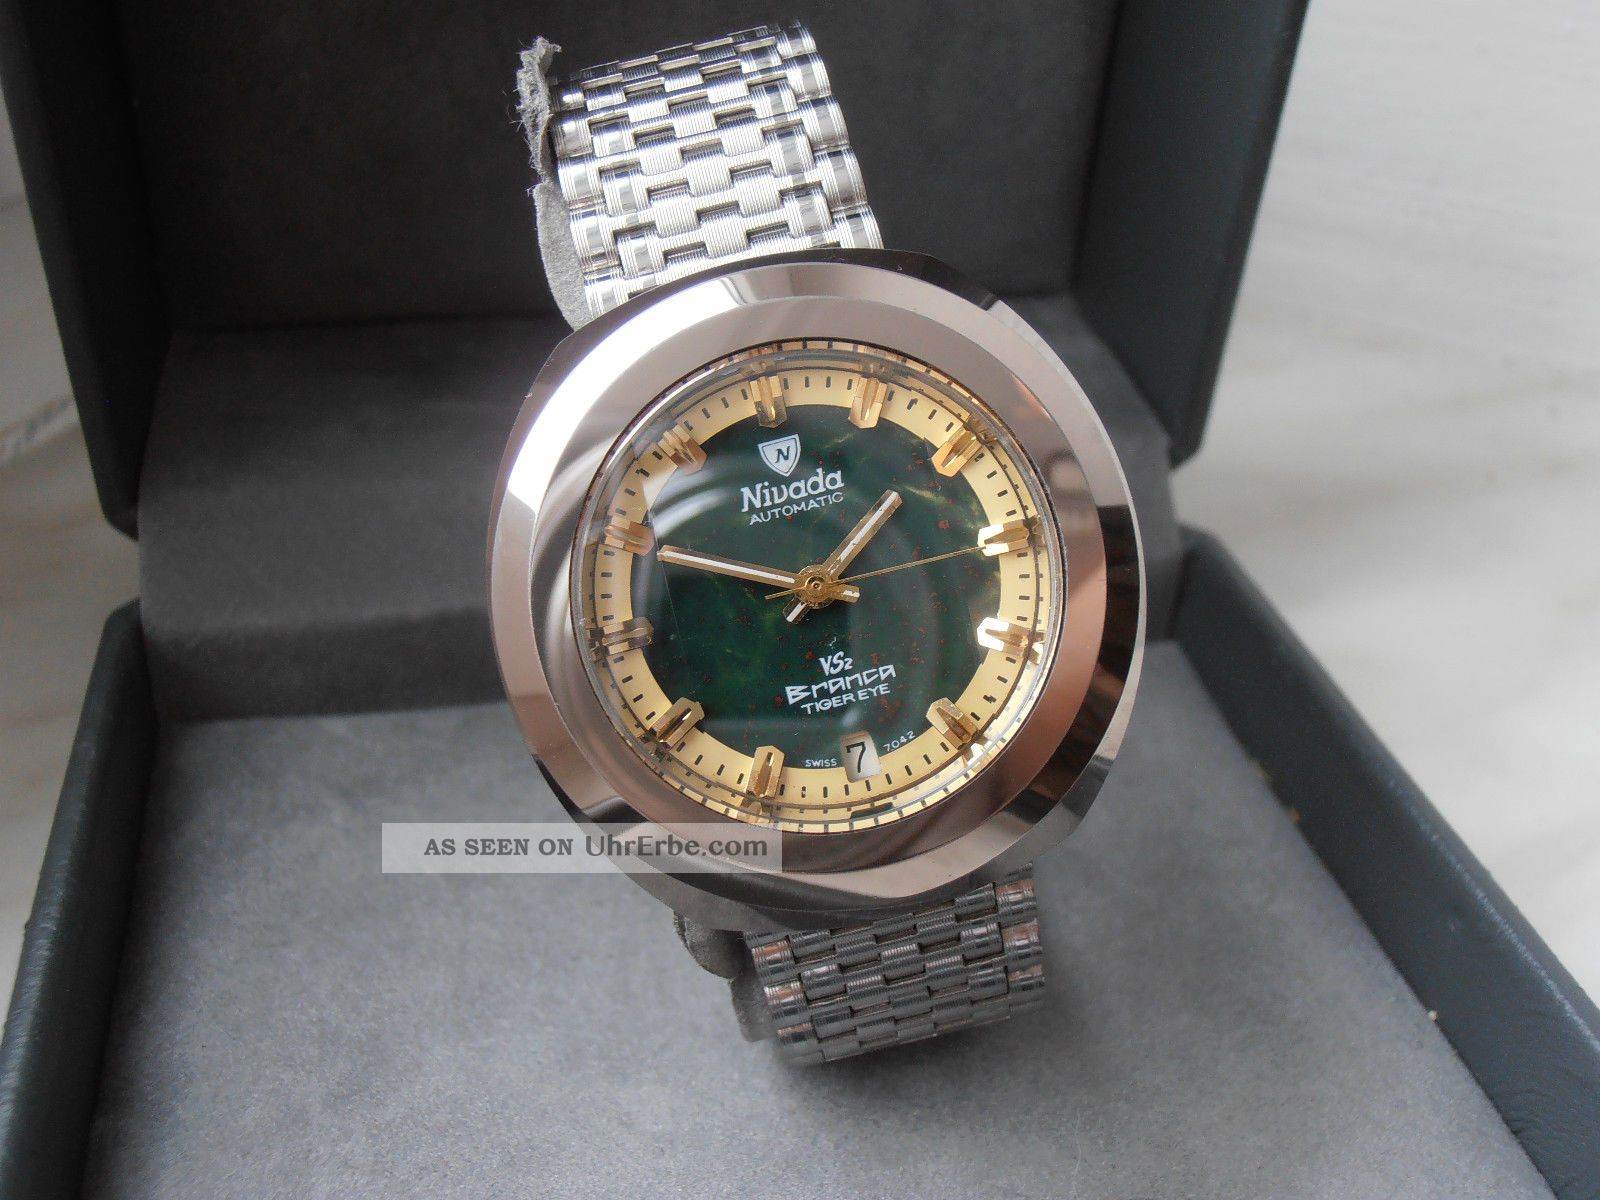 Extrem Rare Nivada Branca Vs2 Automatic Armbanduhren Bild